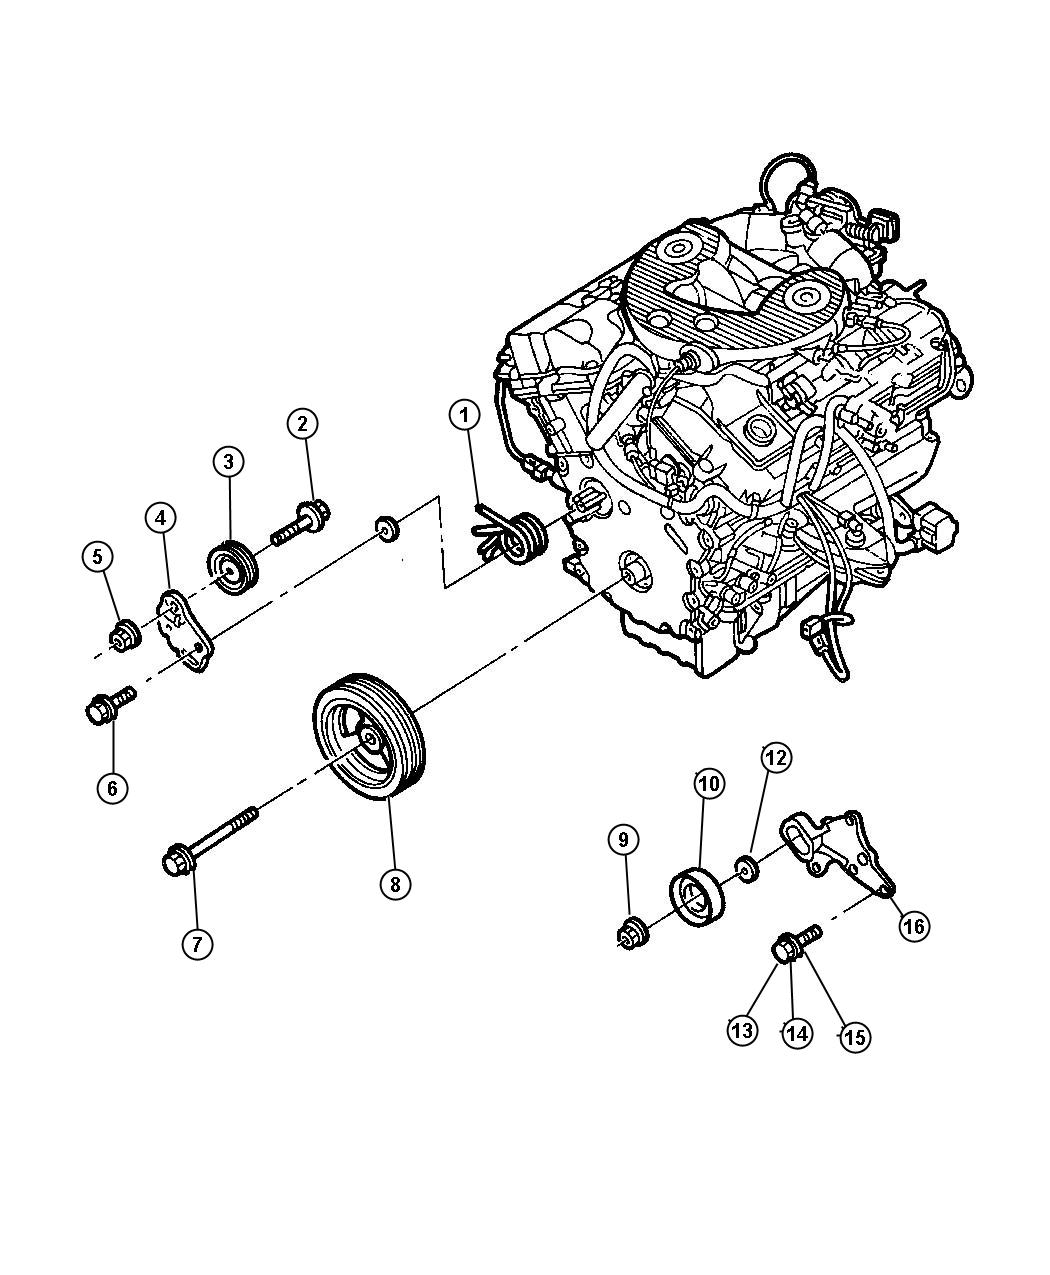 Dodge Intrepid 2 7l V6 Dohc 24 Valve Mpi 4 Speed